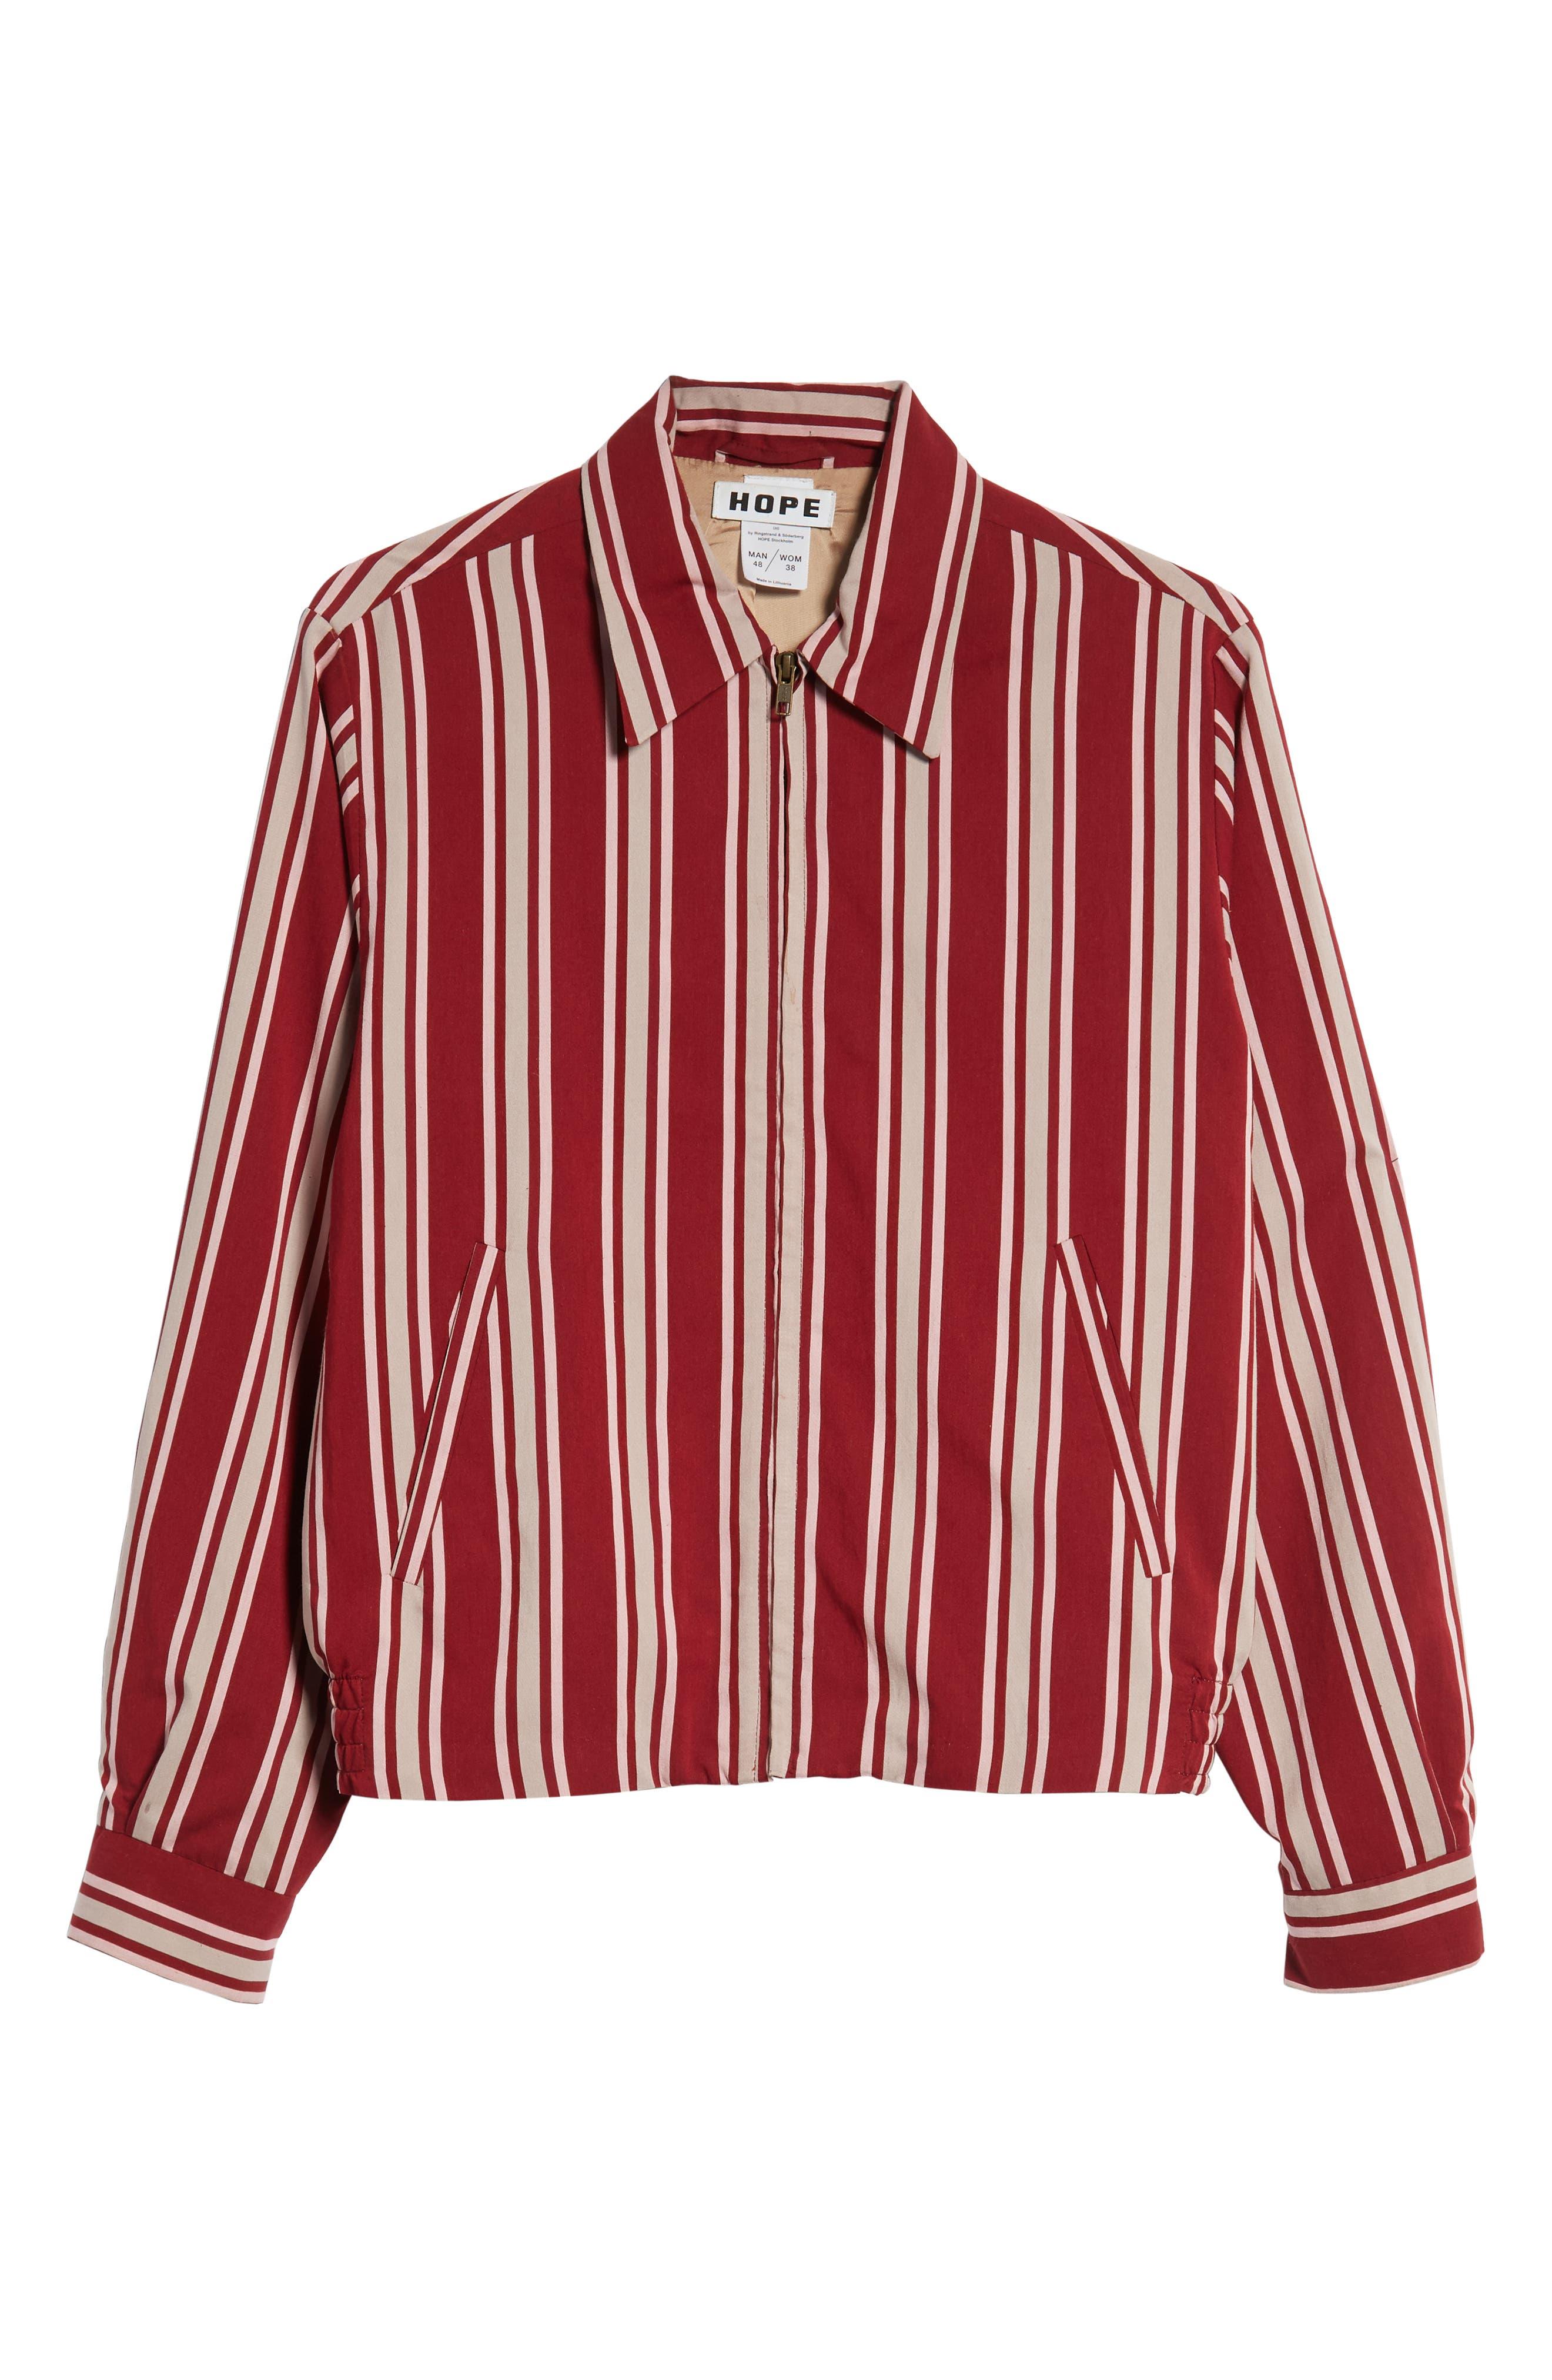 Fifty Regular Fit Shirt Jacket,                             Alternate thumbnail 6, color,                             RED STRIPE